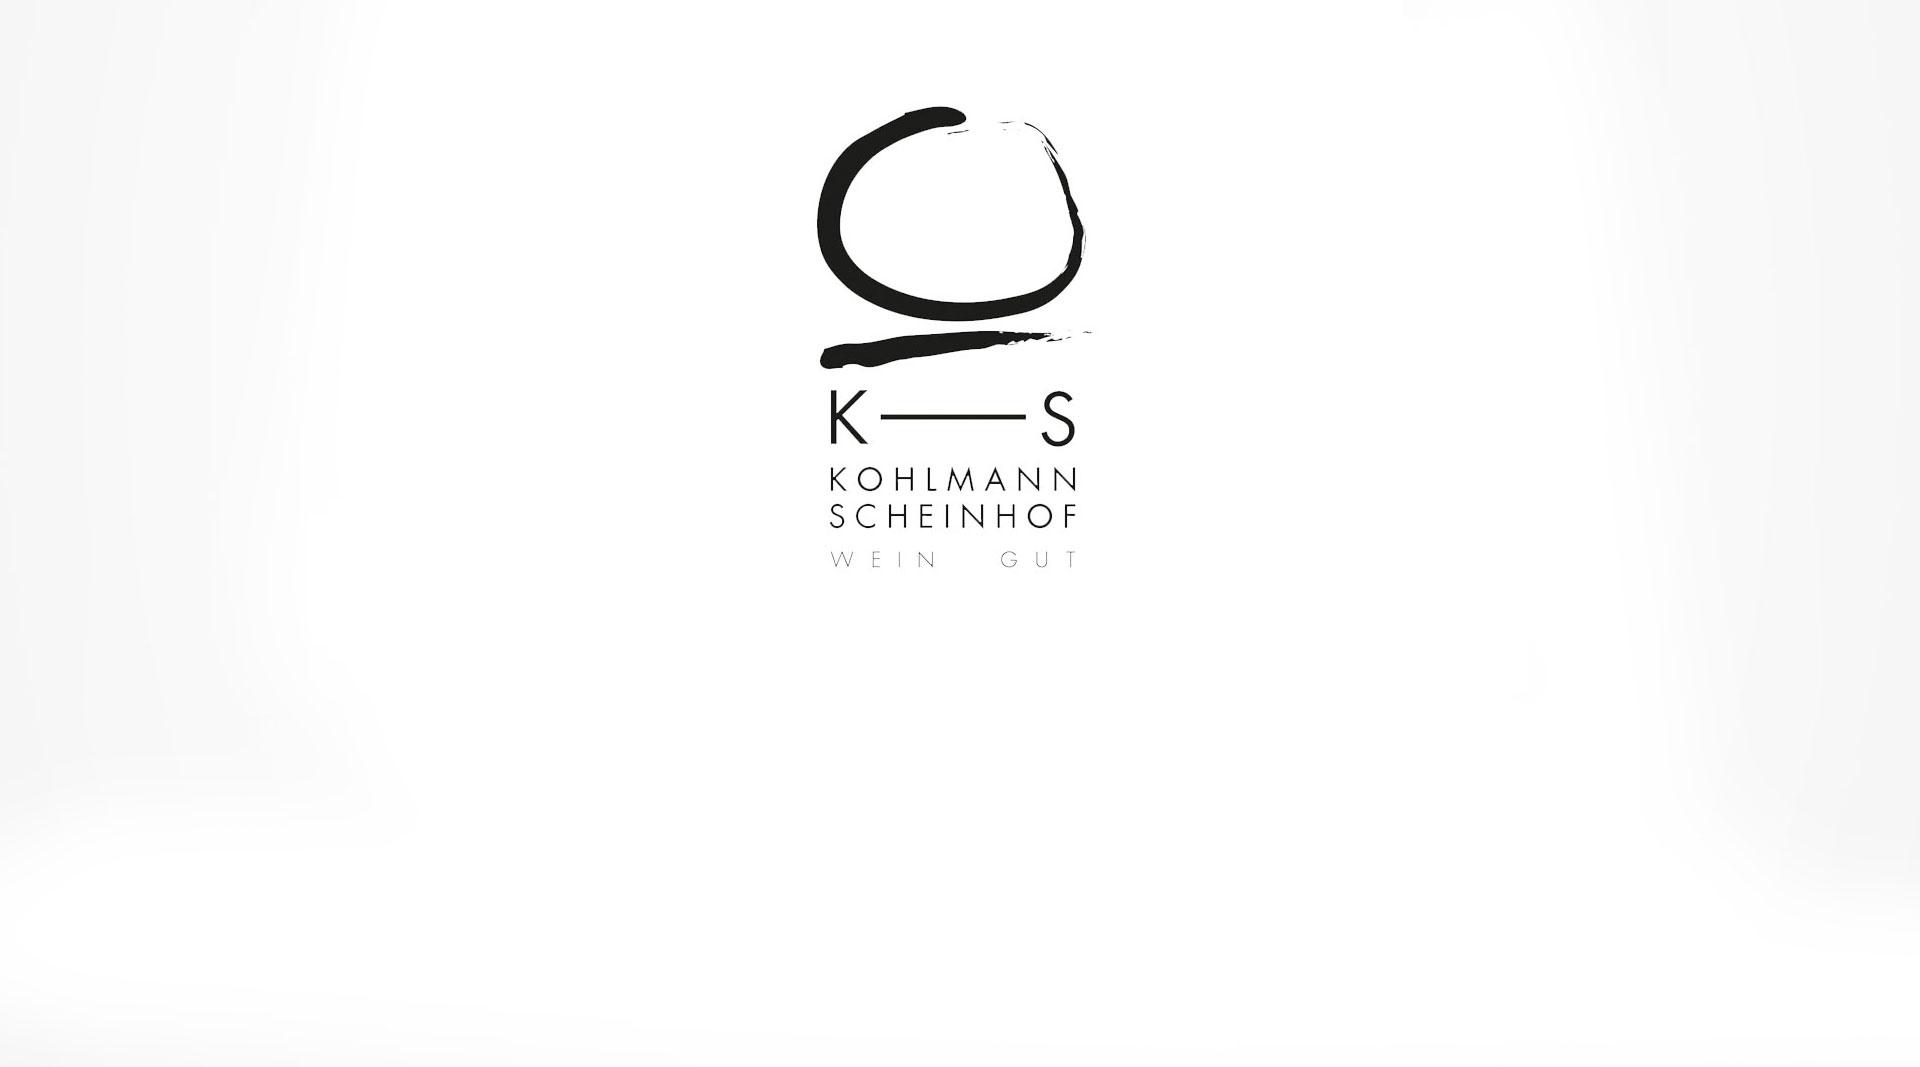 Logo K-S Weingut